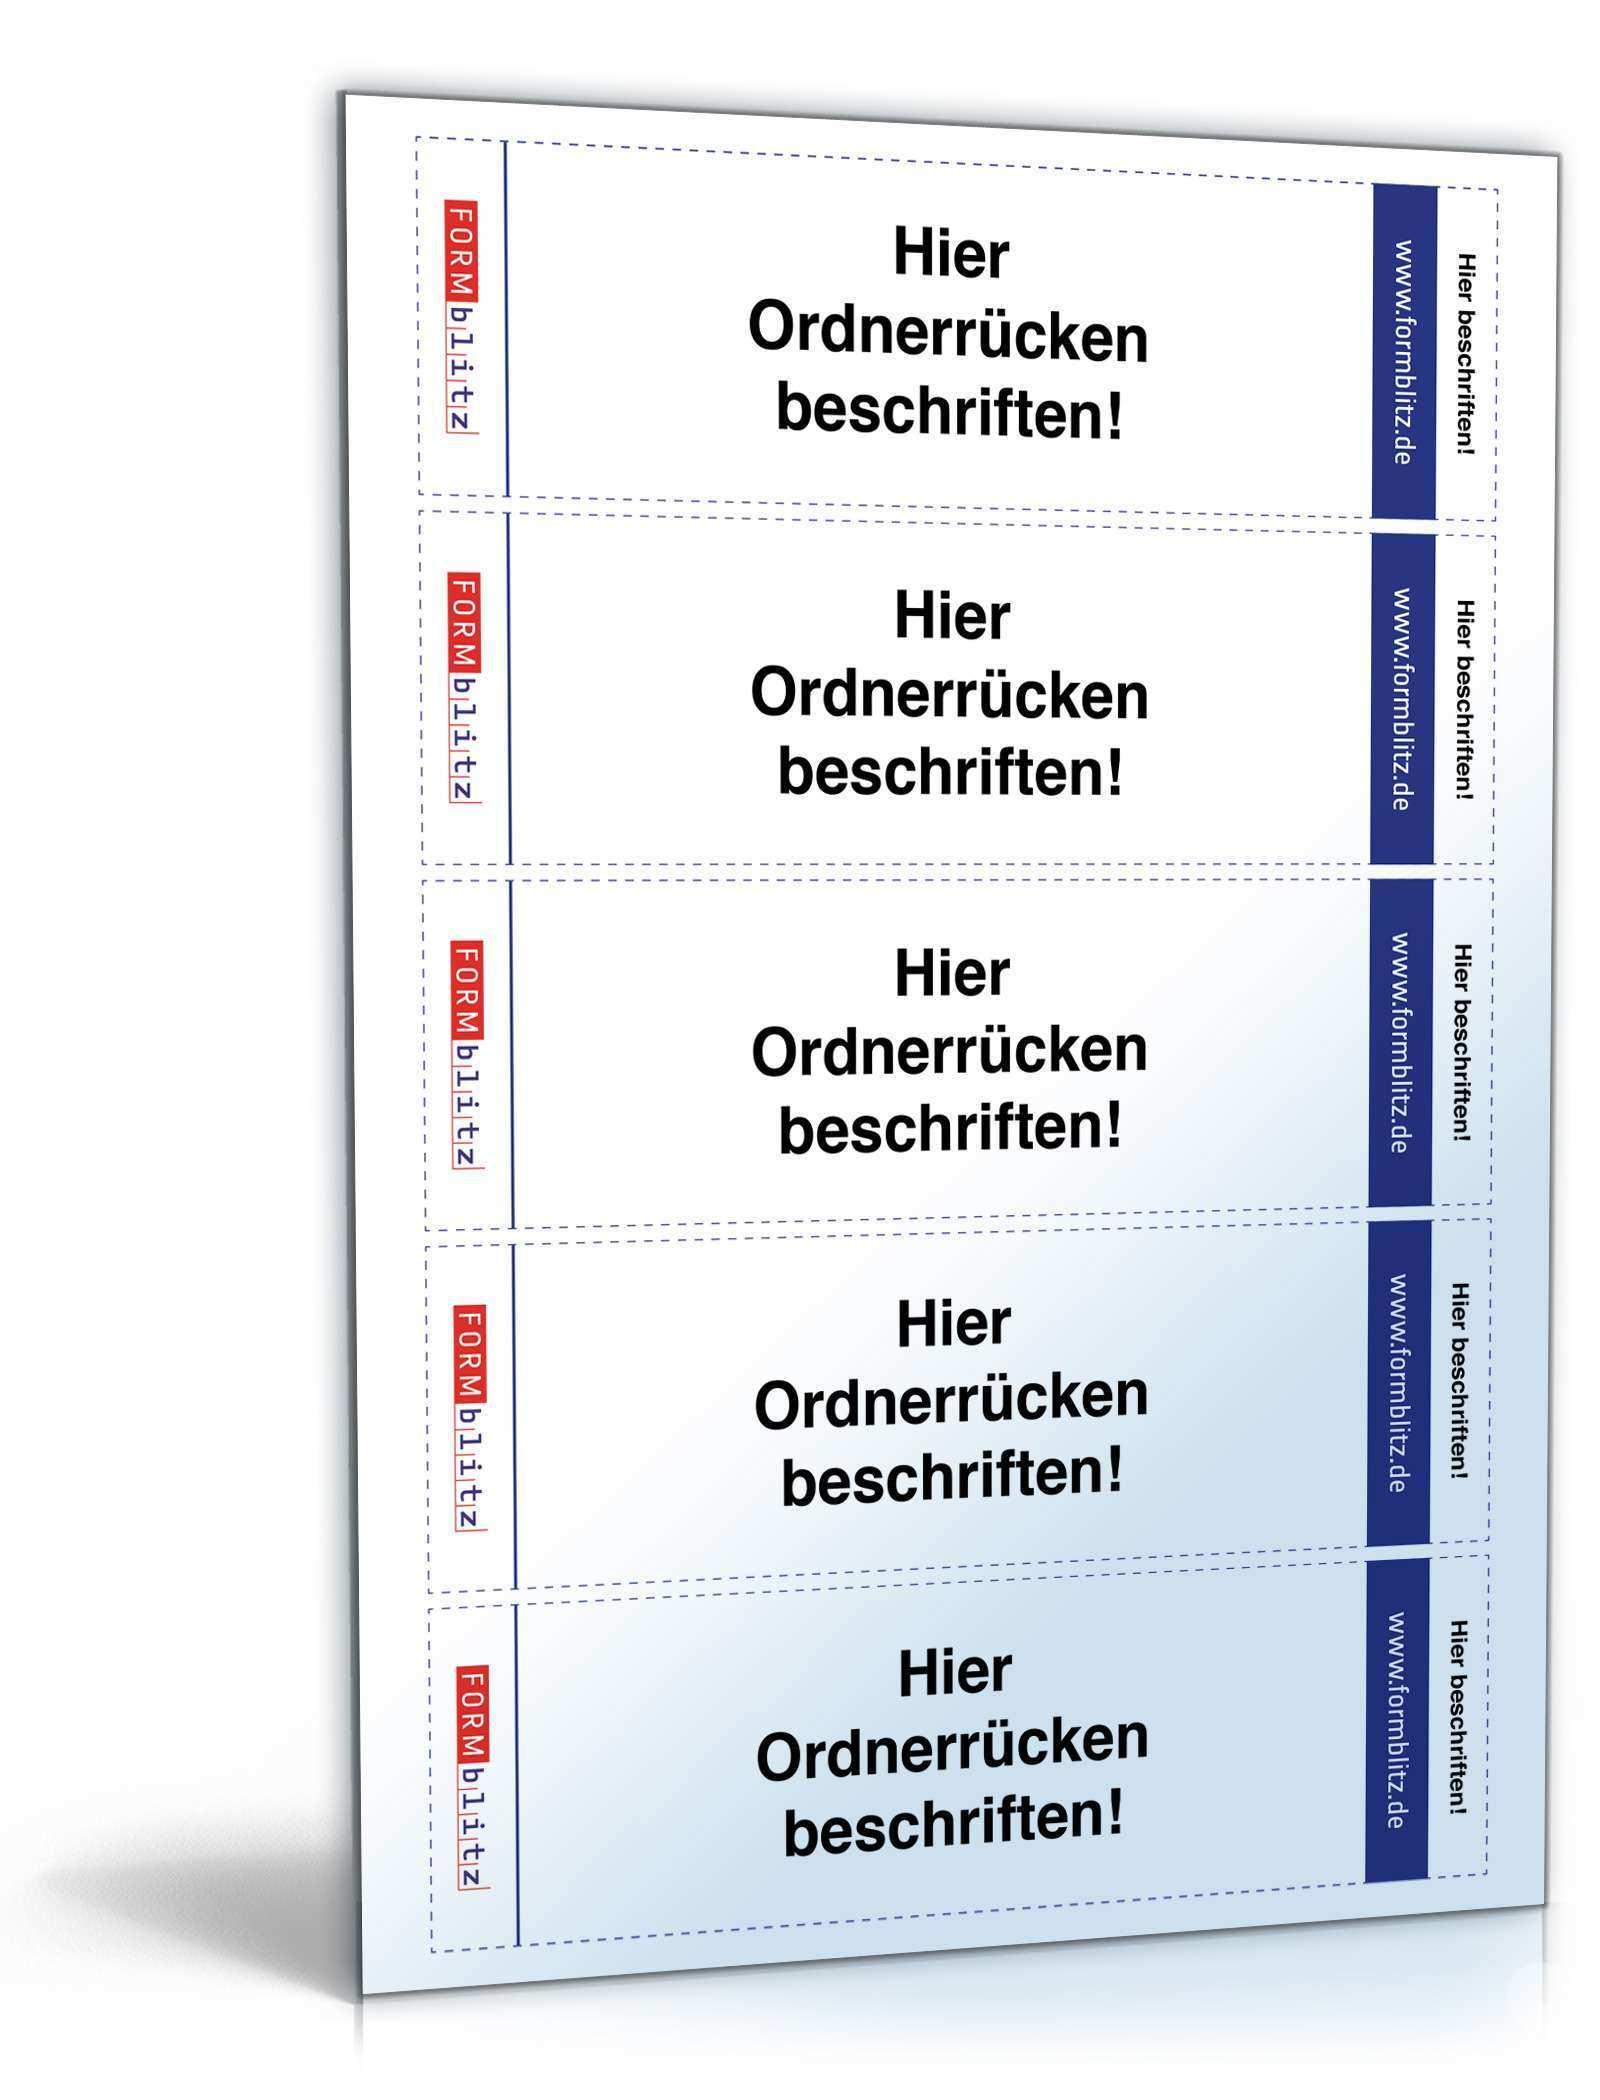 Ordnerrucken Fur Leitz Ordner Hochformat 5 3 X 18 8